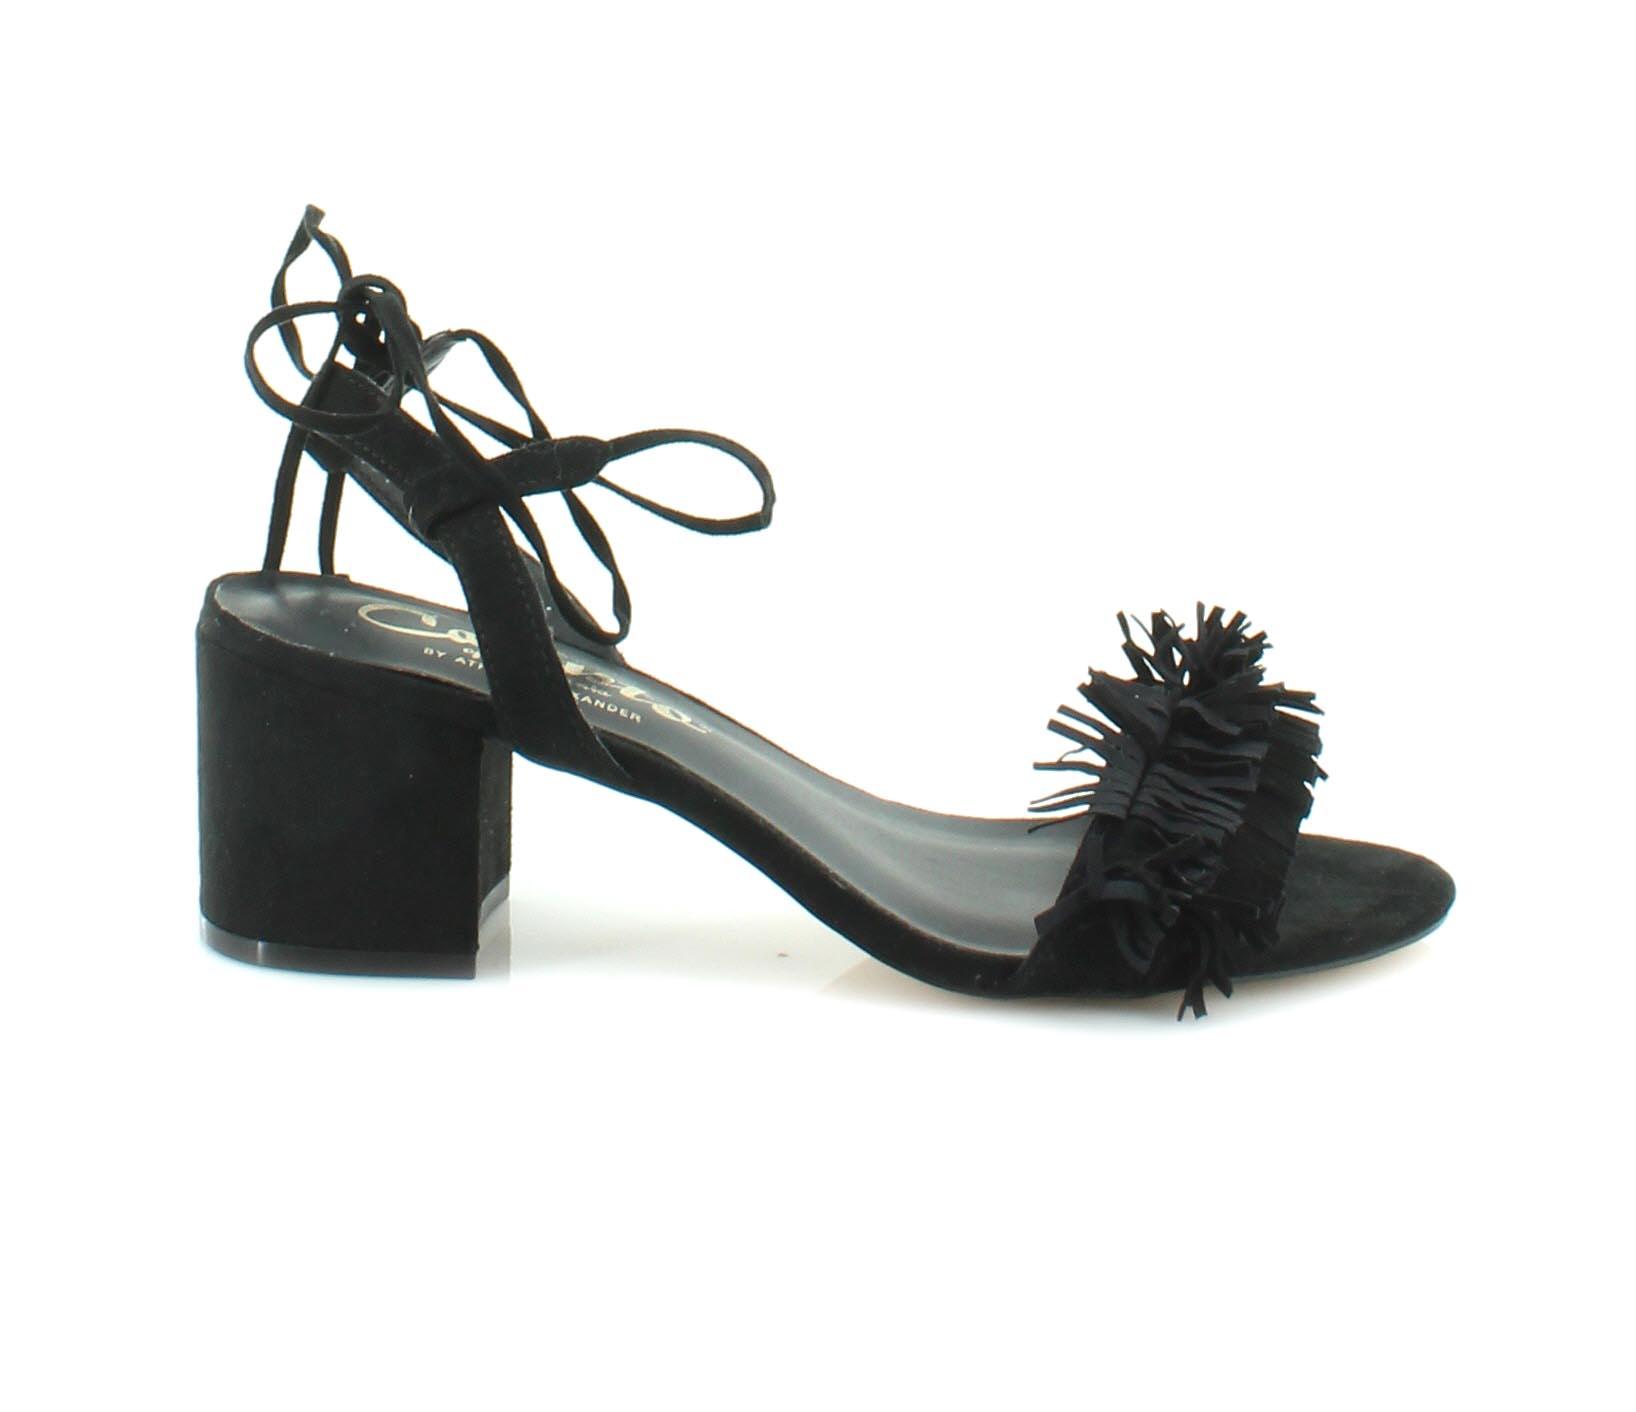 763f8faeb584 Image is loading Callisto-Melz-Women-039-s-Sandals-Black